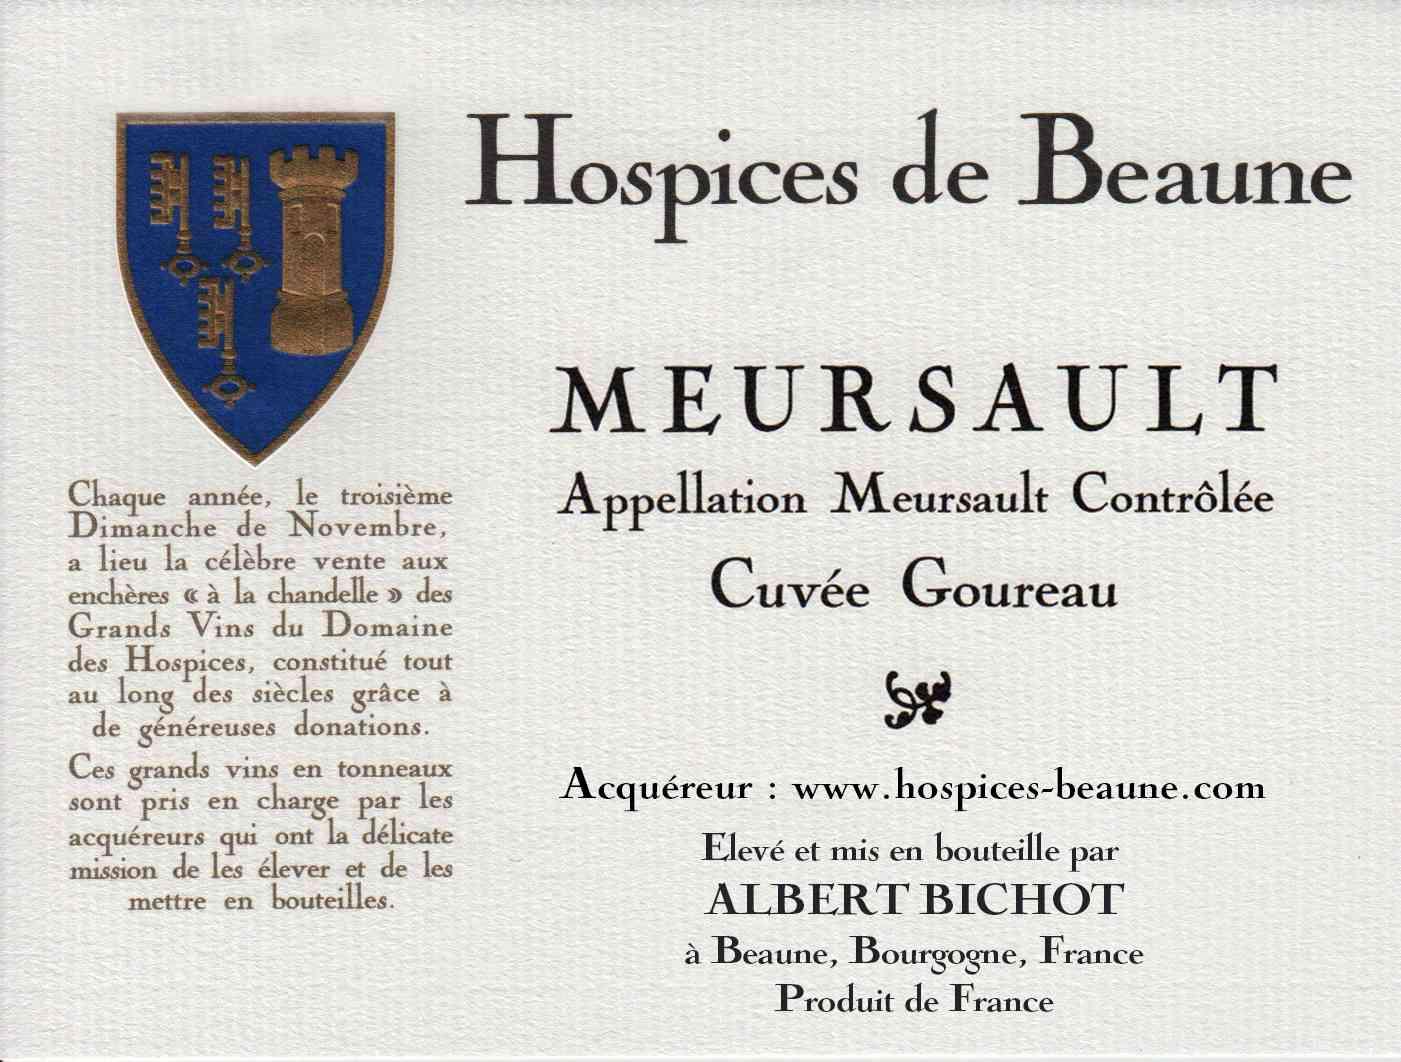 Encheres-auction-HospicesdeBeaune-AlbertBichot-Meursault-Cuvee-Goureau